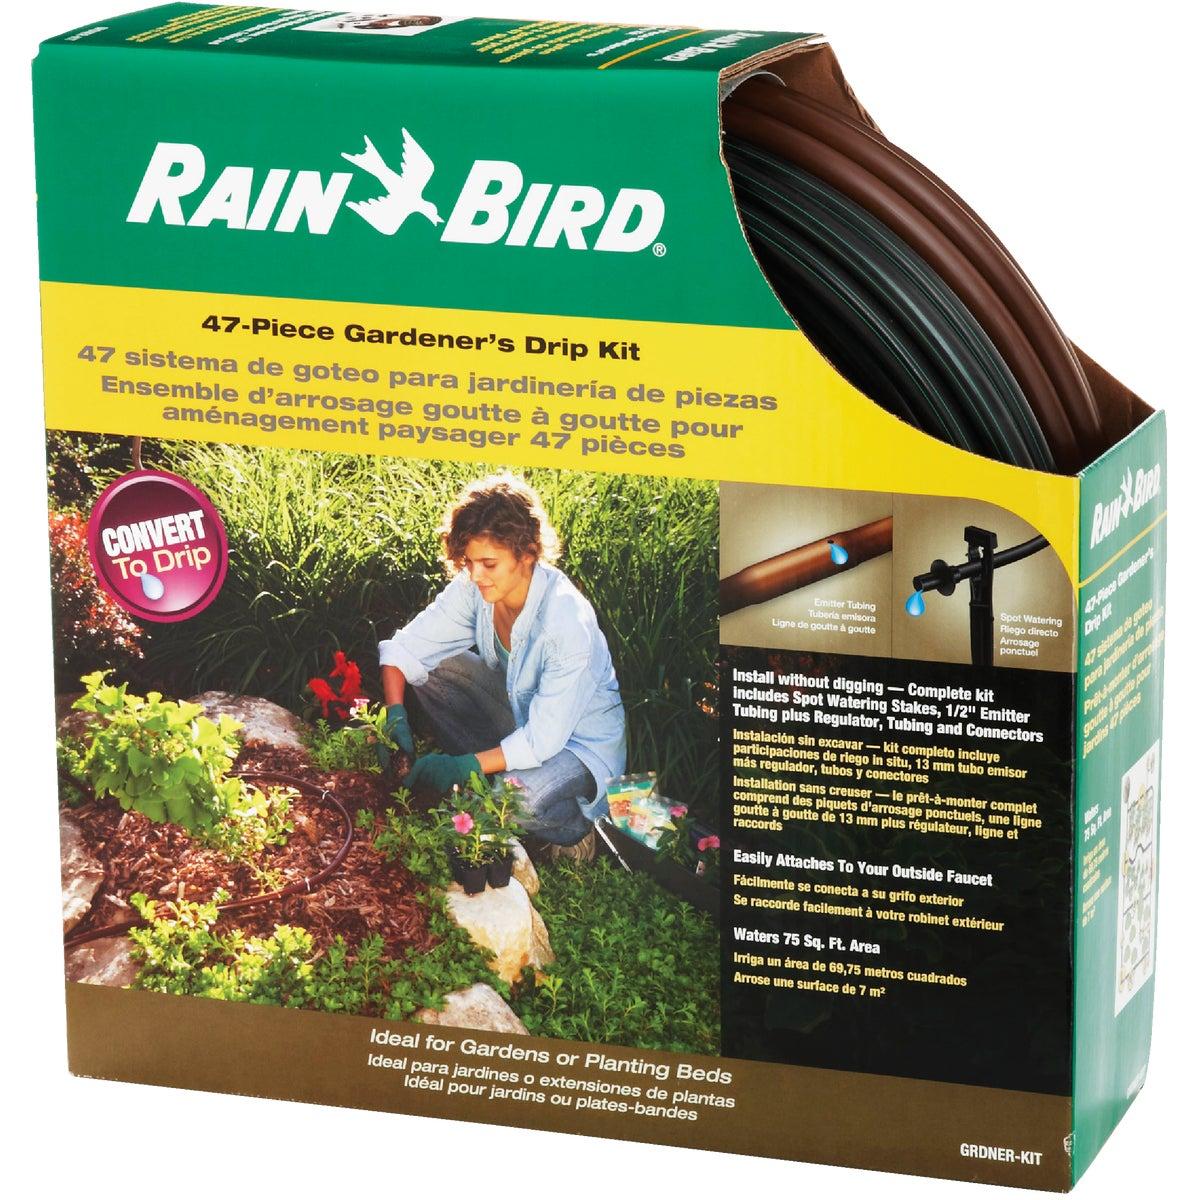 Rain Bird GRDNERKIT Drip Irrigation Gardener's Drip Kit